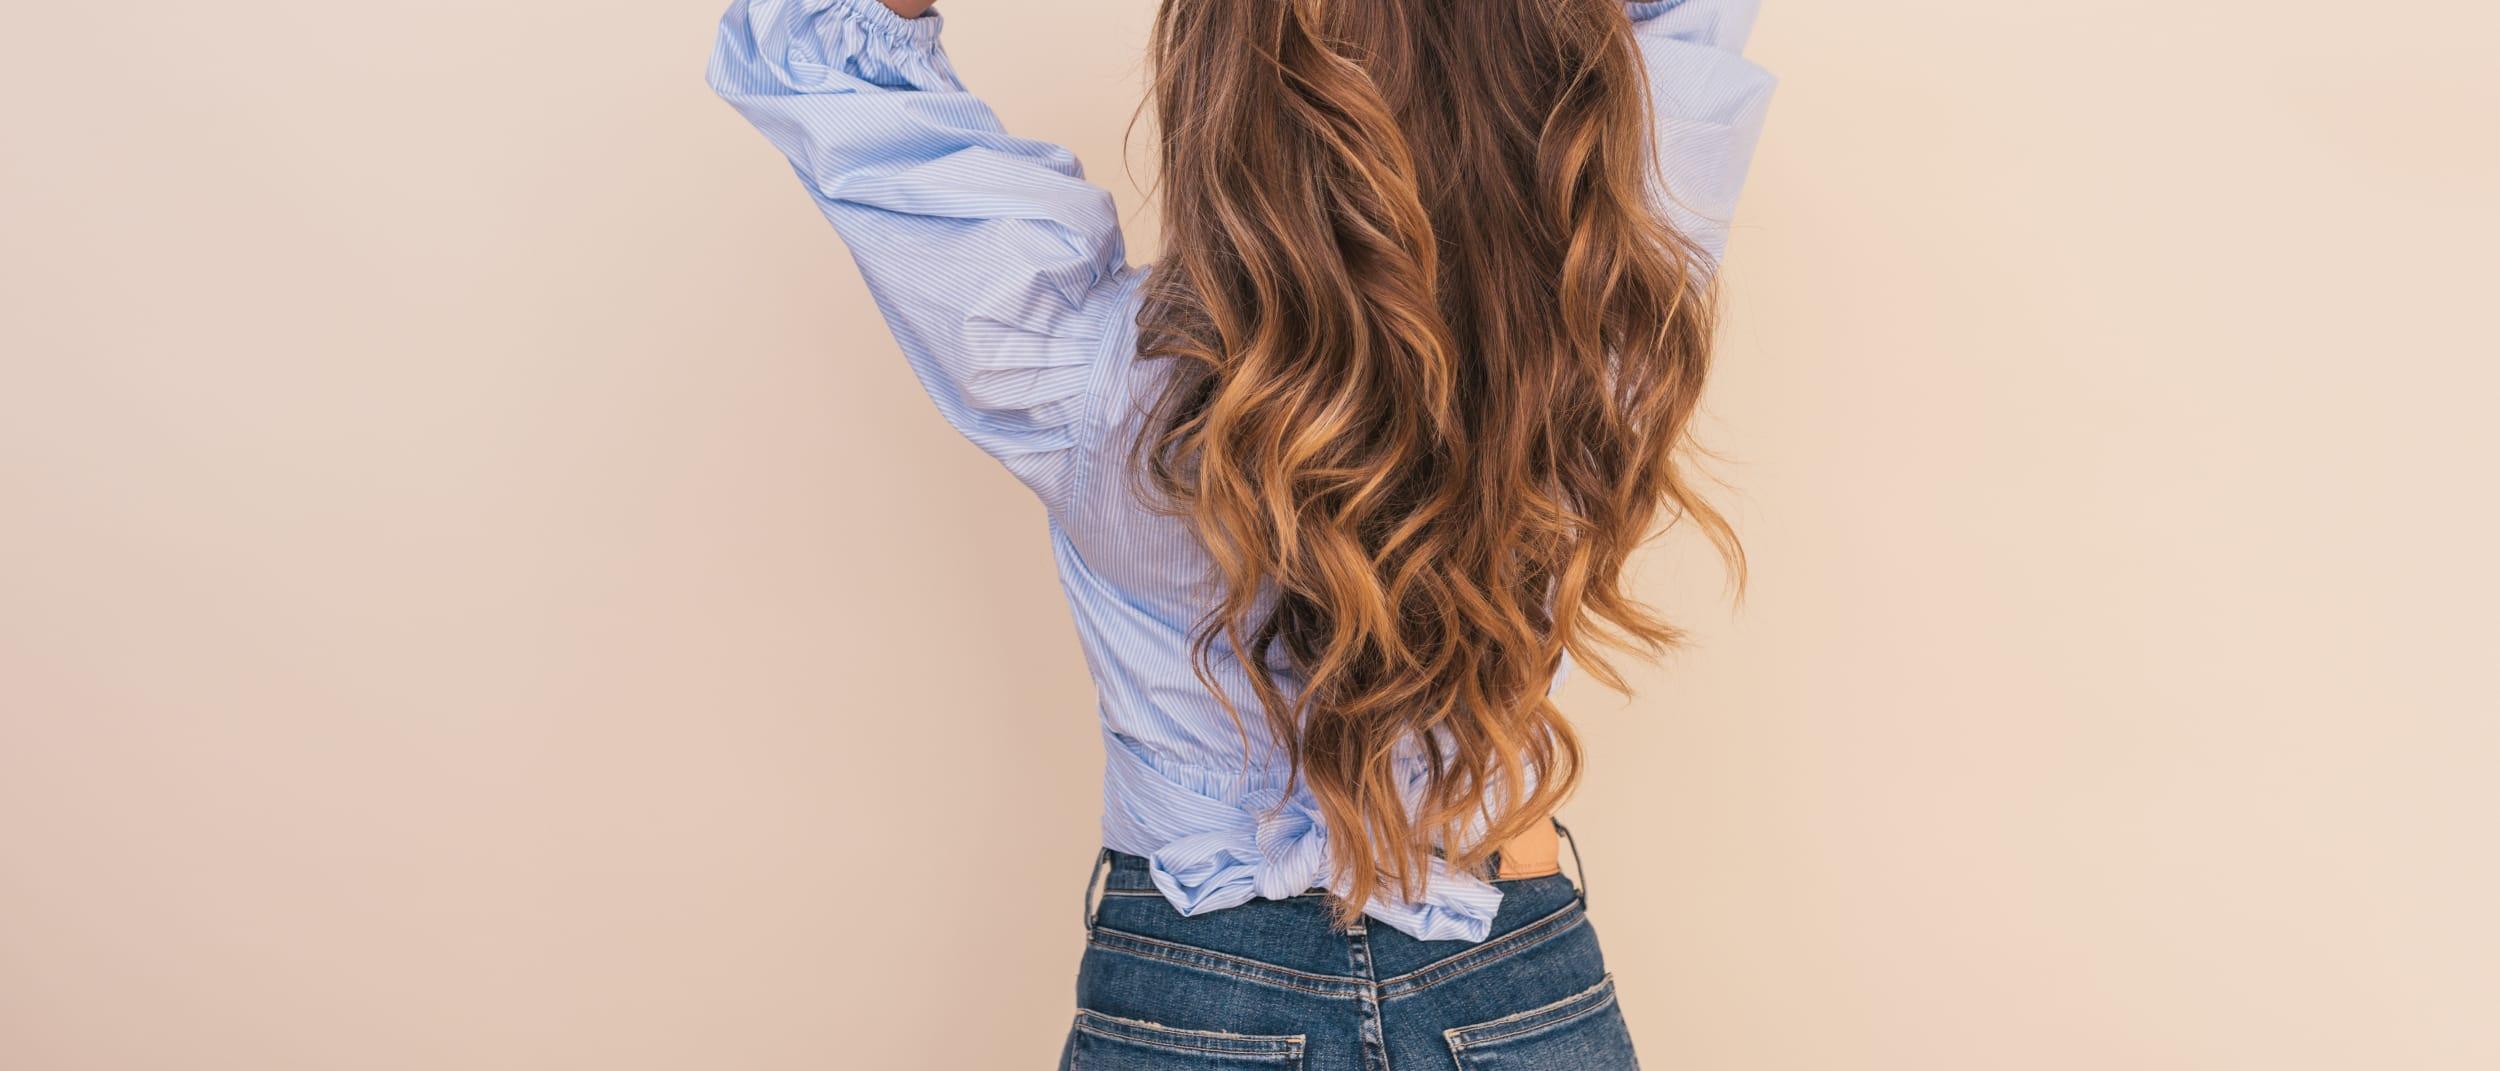 SuLin Hair Design: Balayage special